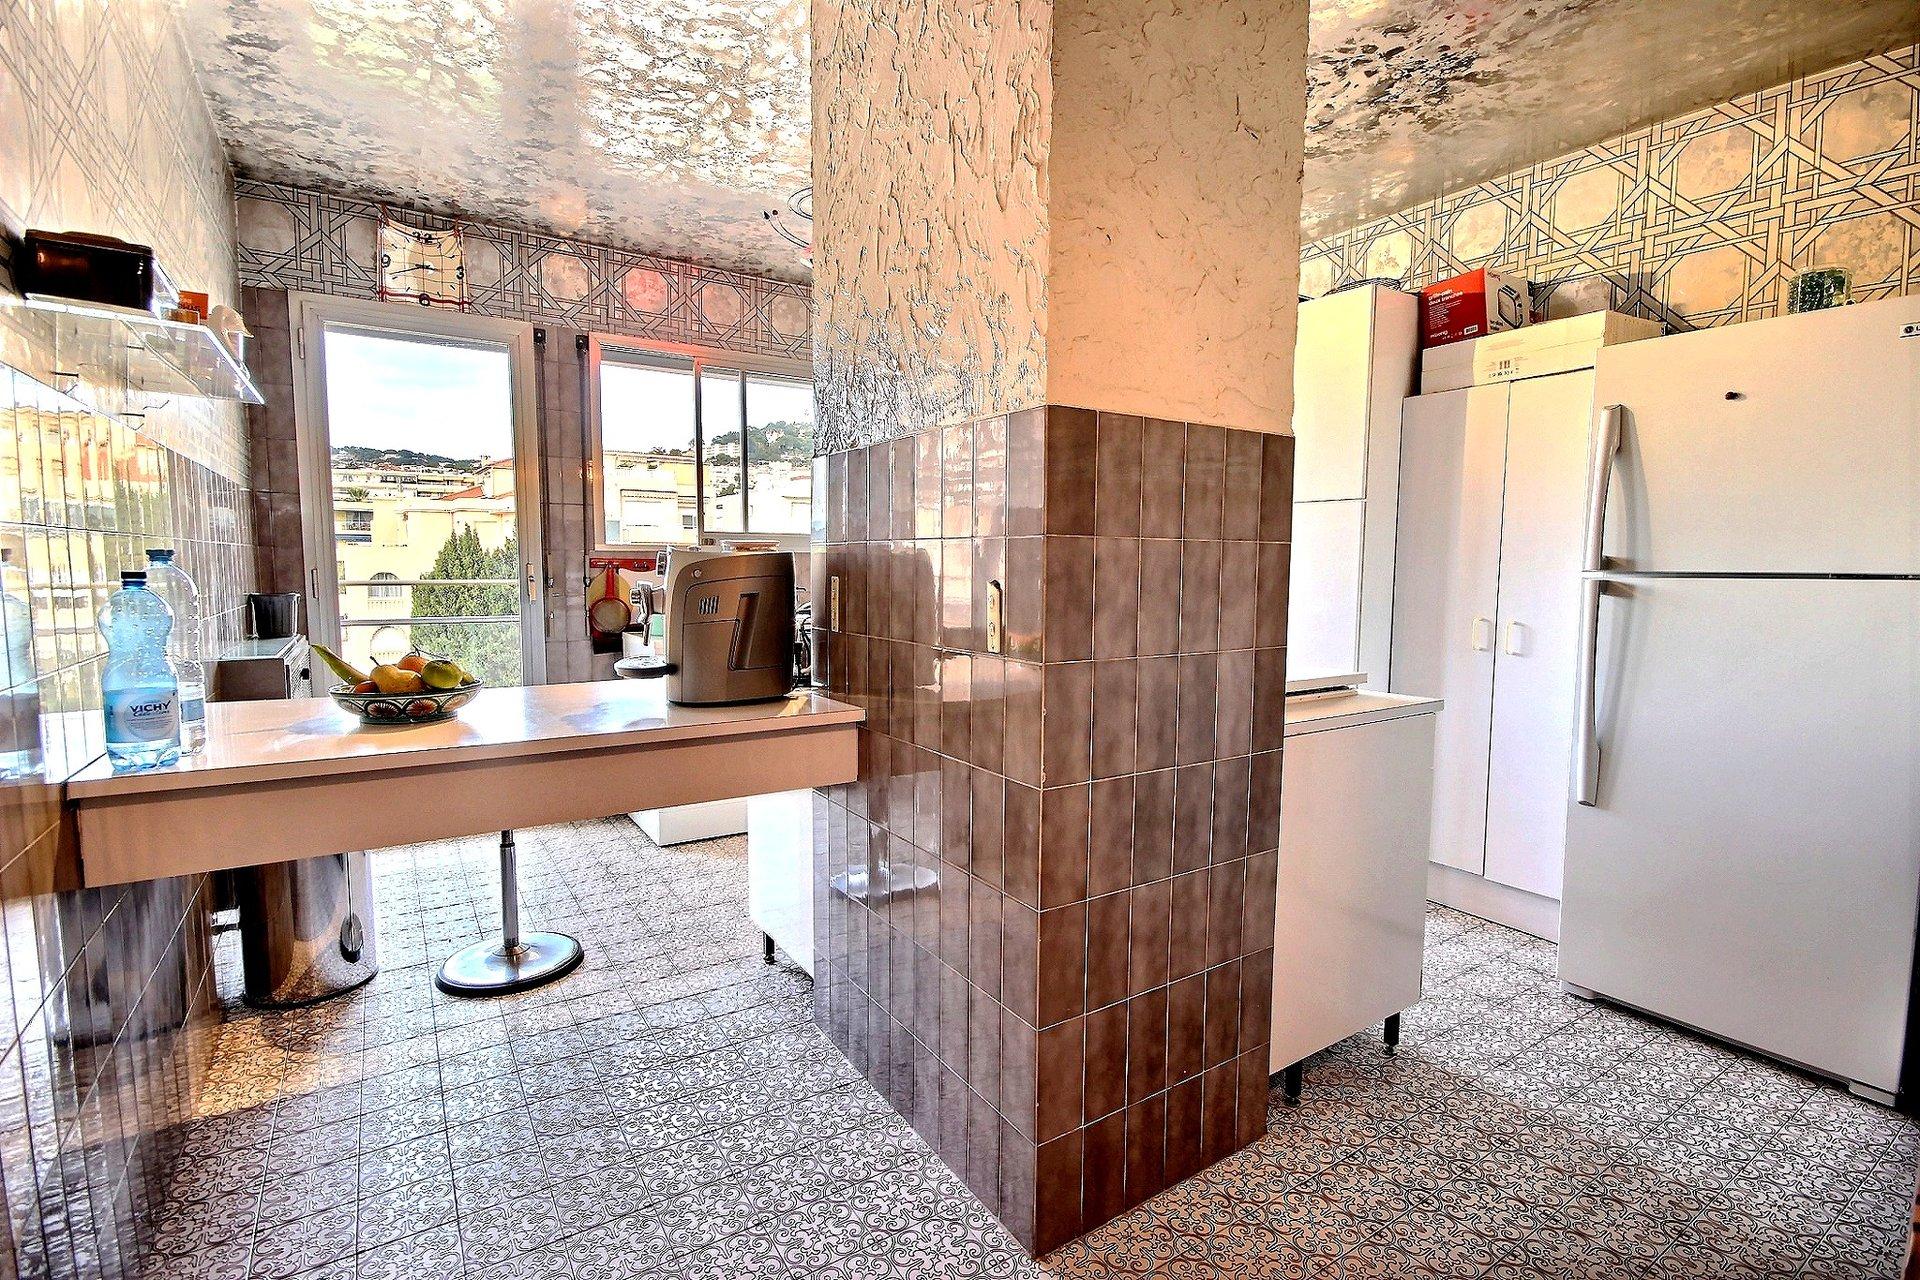 Superb apartment for sale Cannes Basse Californie